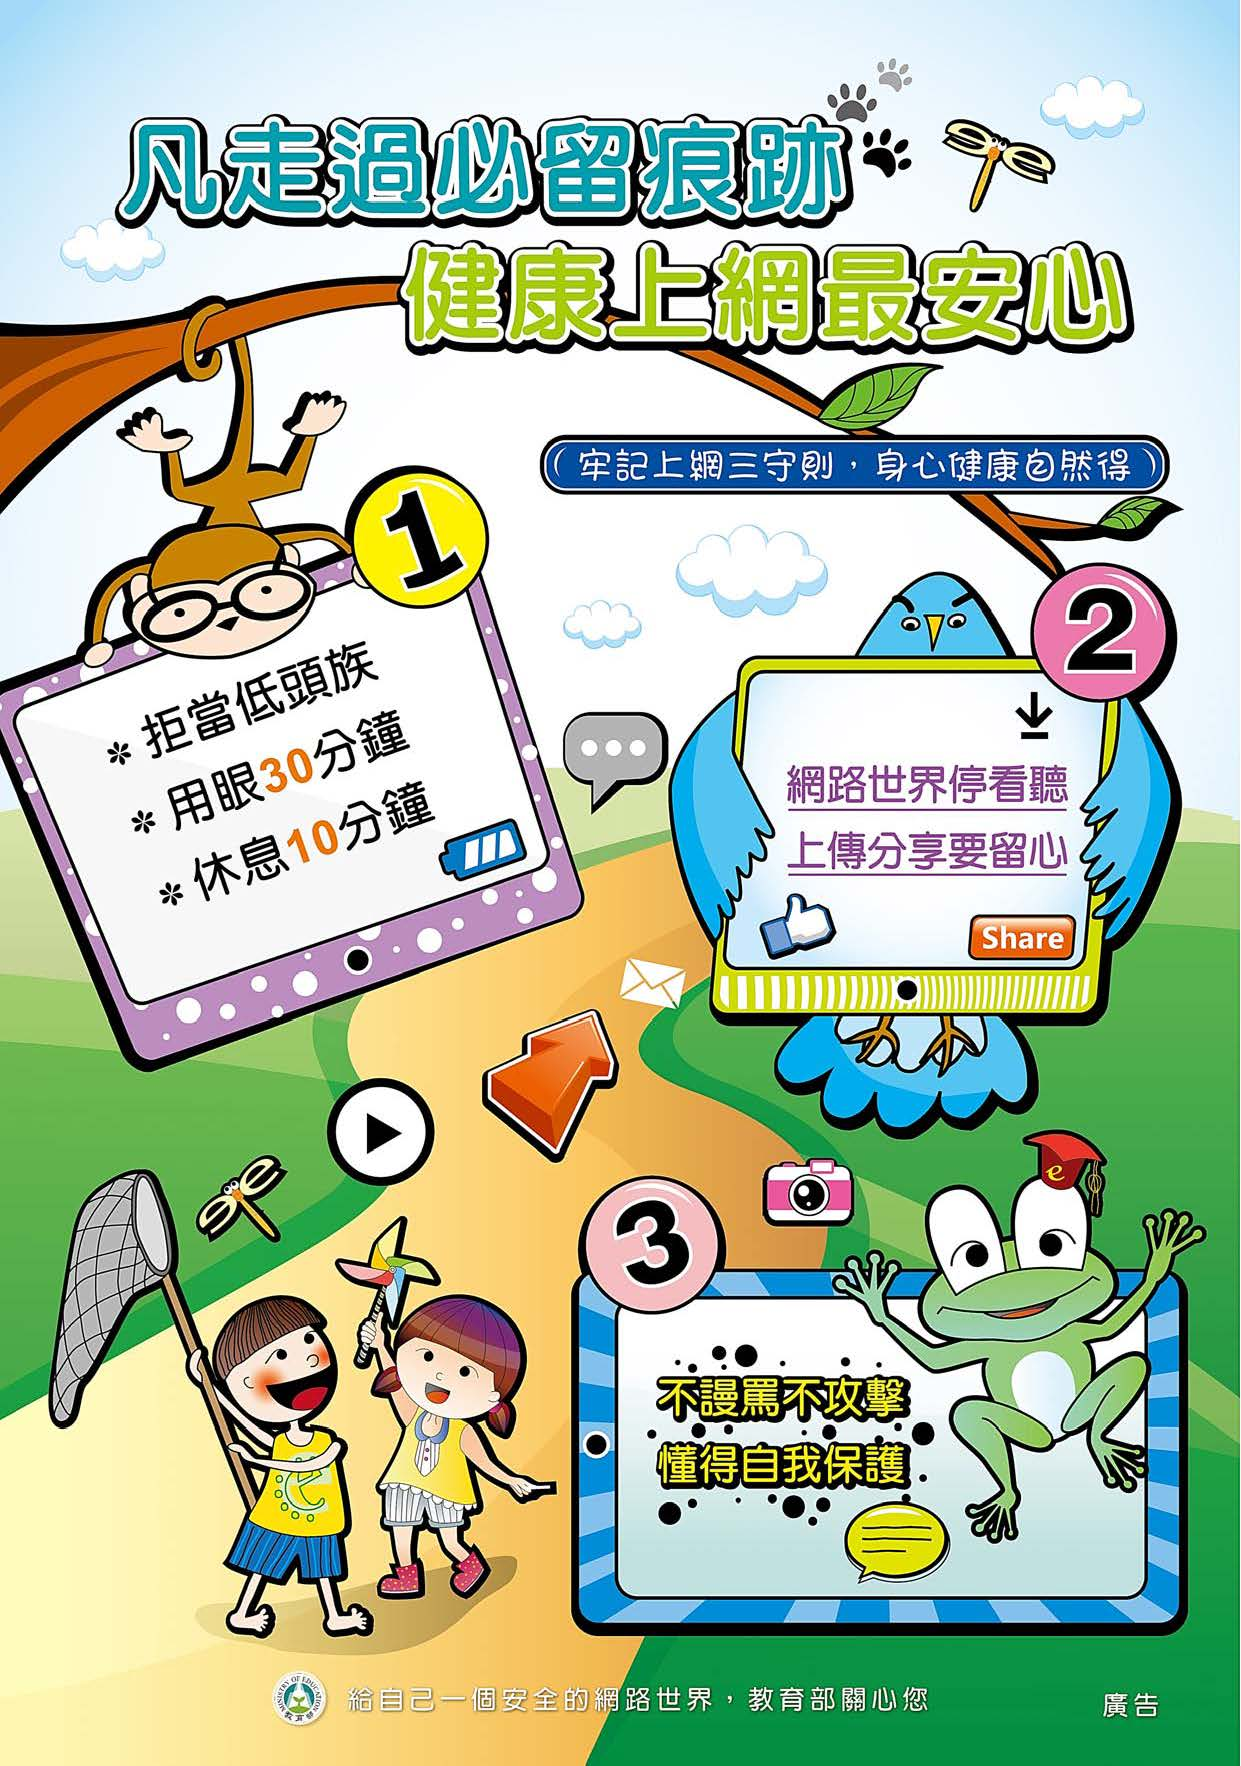 http://www.tpps.cyc.edu.tw/uploads/tadgallery/2017_09_21/3568_上網三守則.jpg